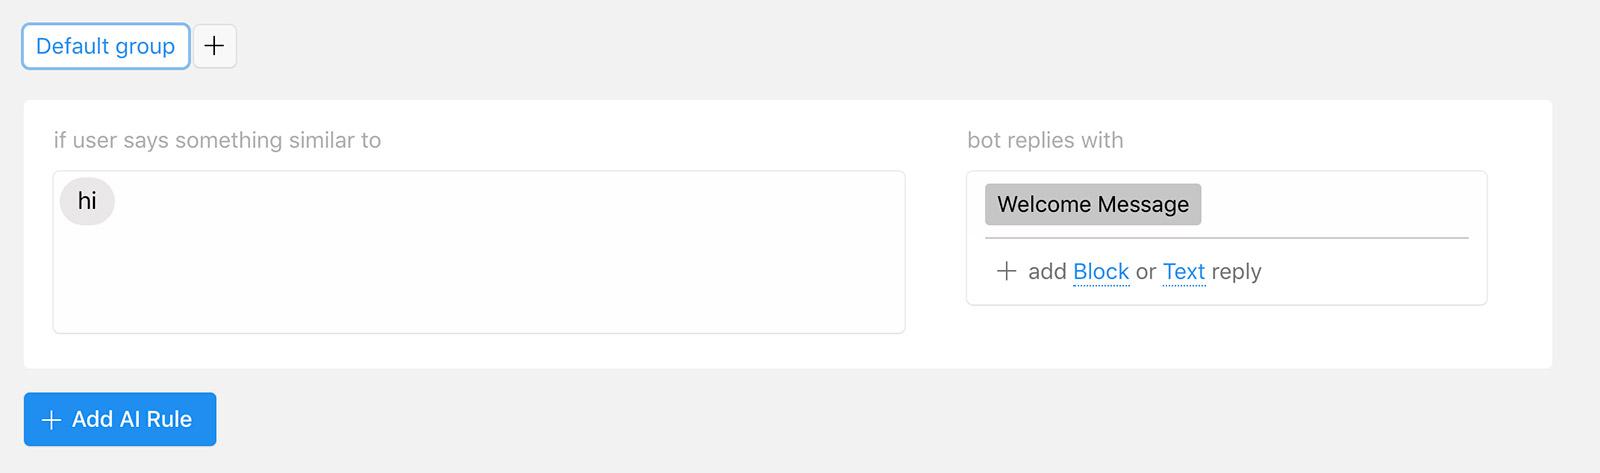 chatfuel-keywords